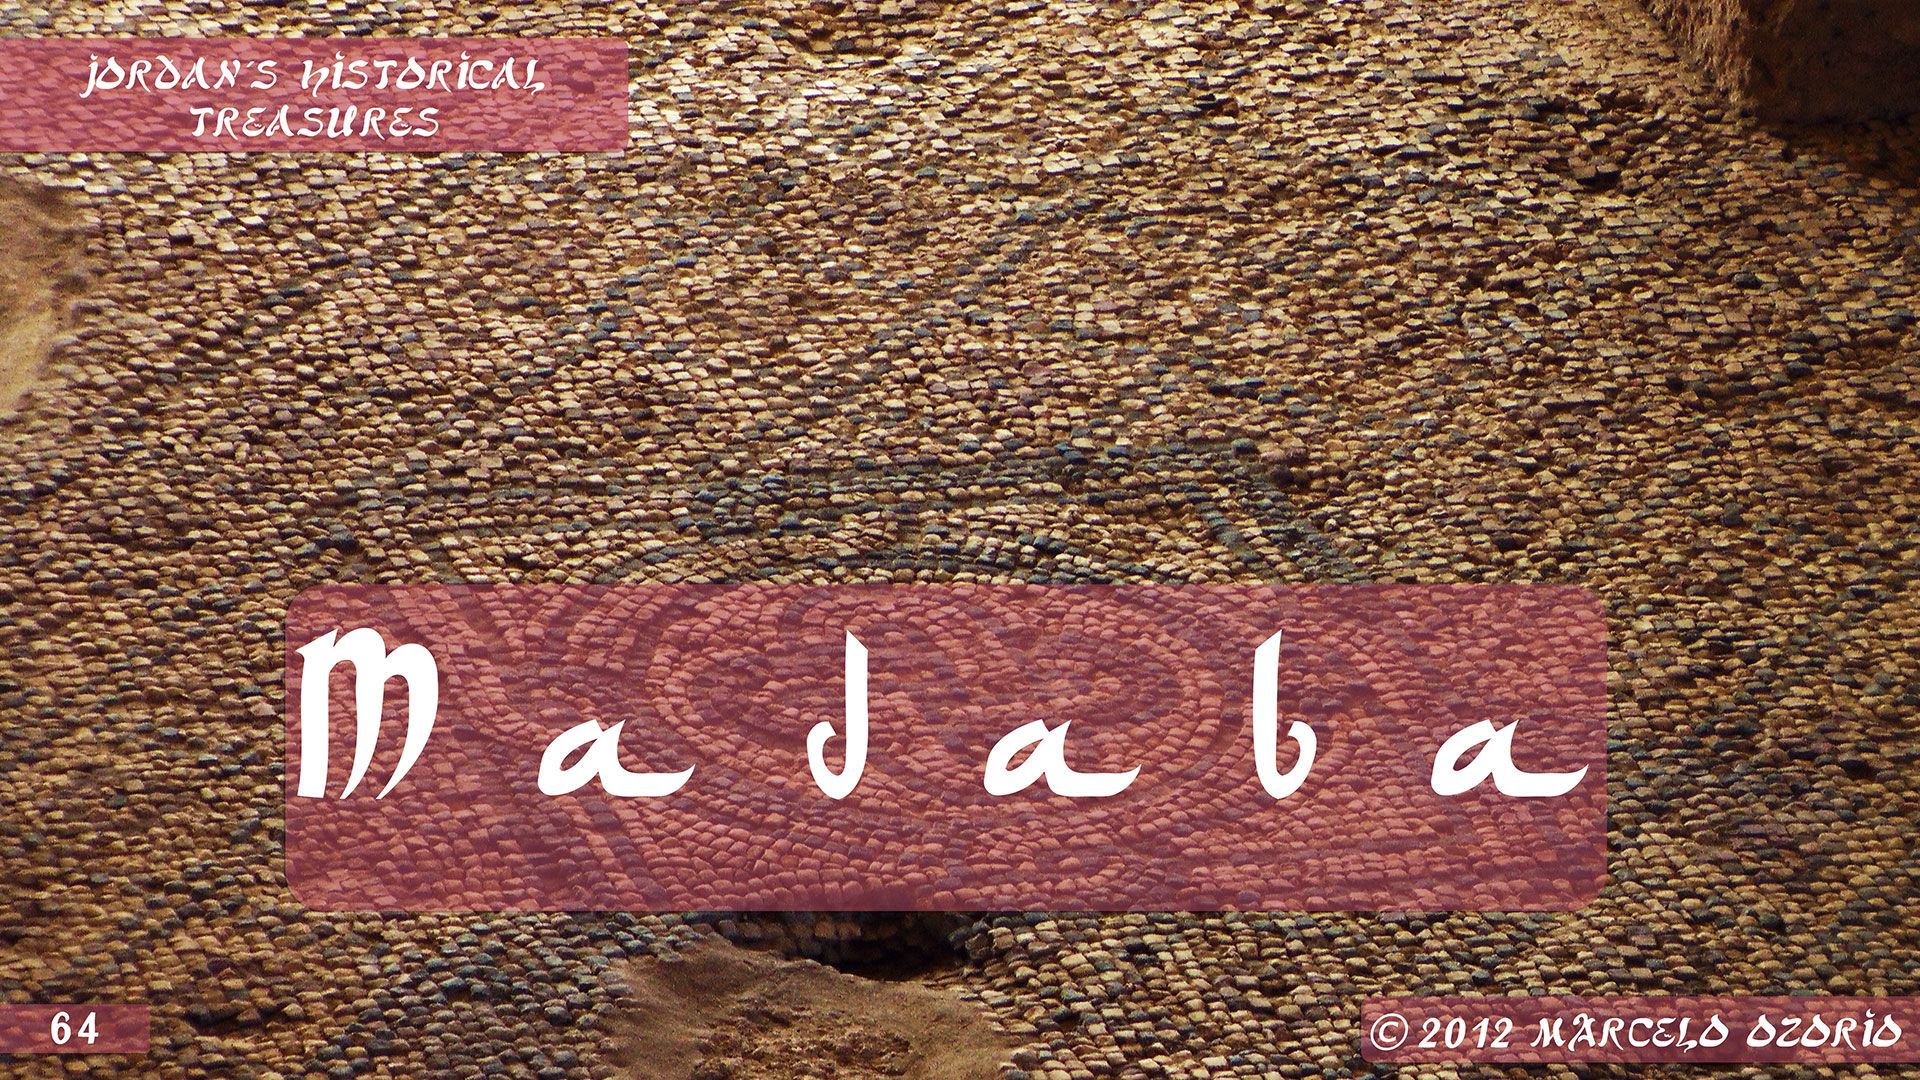 Madaba Mosaics Jordan 1 - Madaba, Mosaicos da Era Bíblica